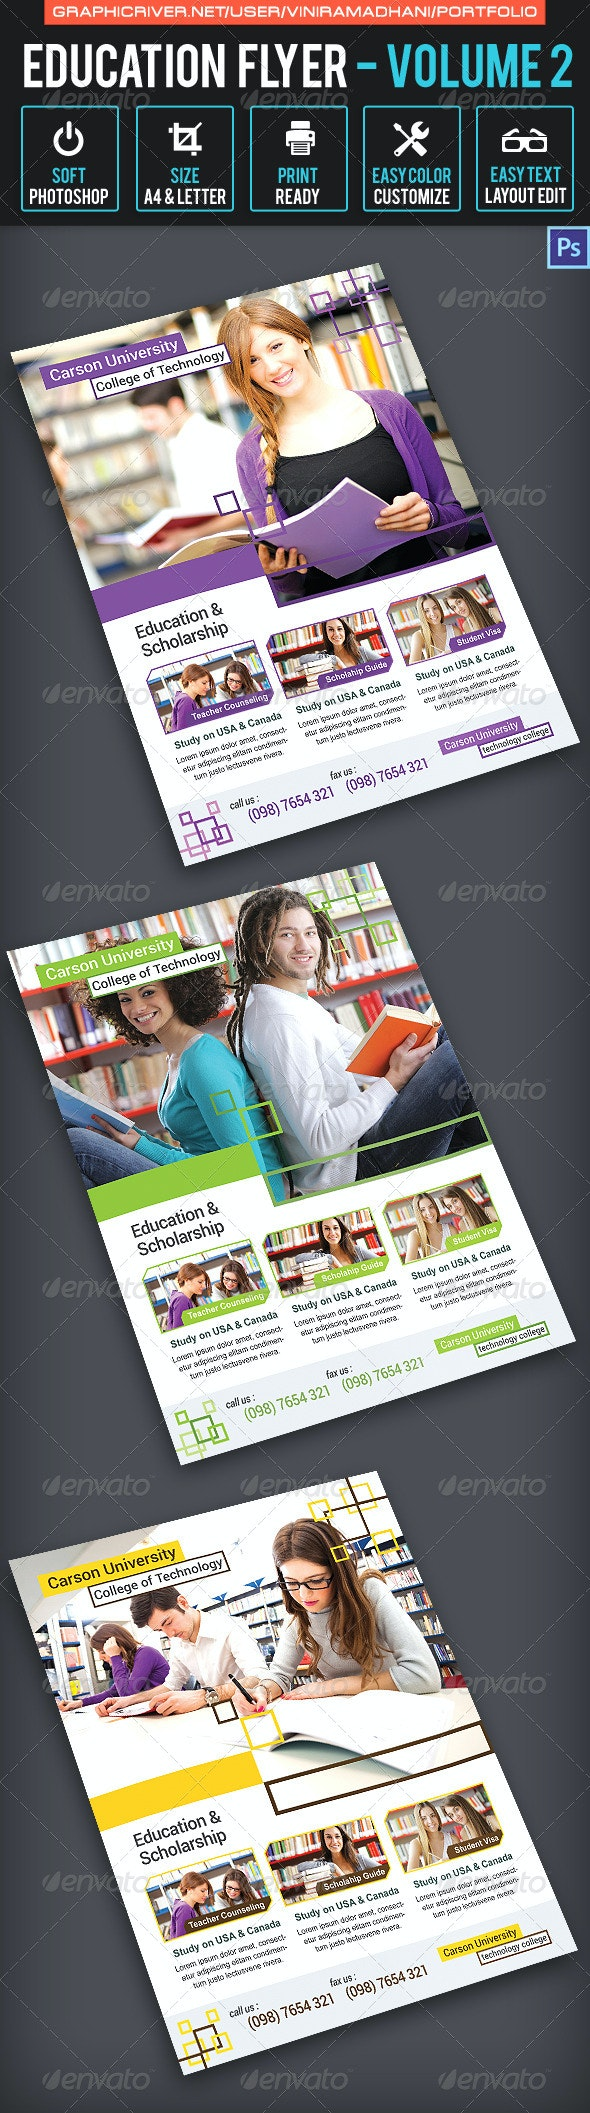 Education Flyer Volume 2 - Corporate Flyers